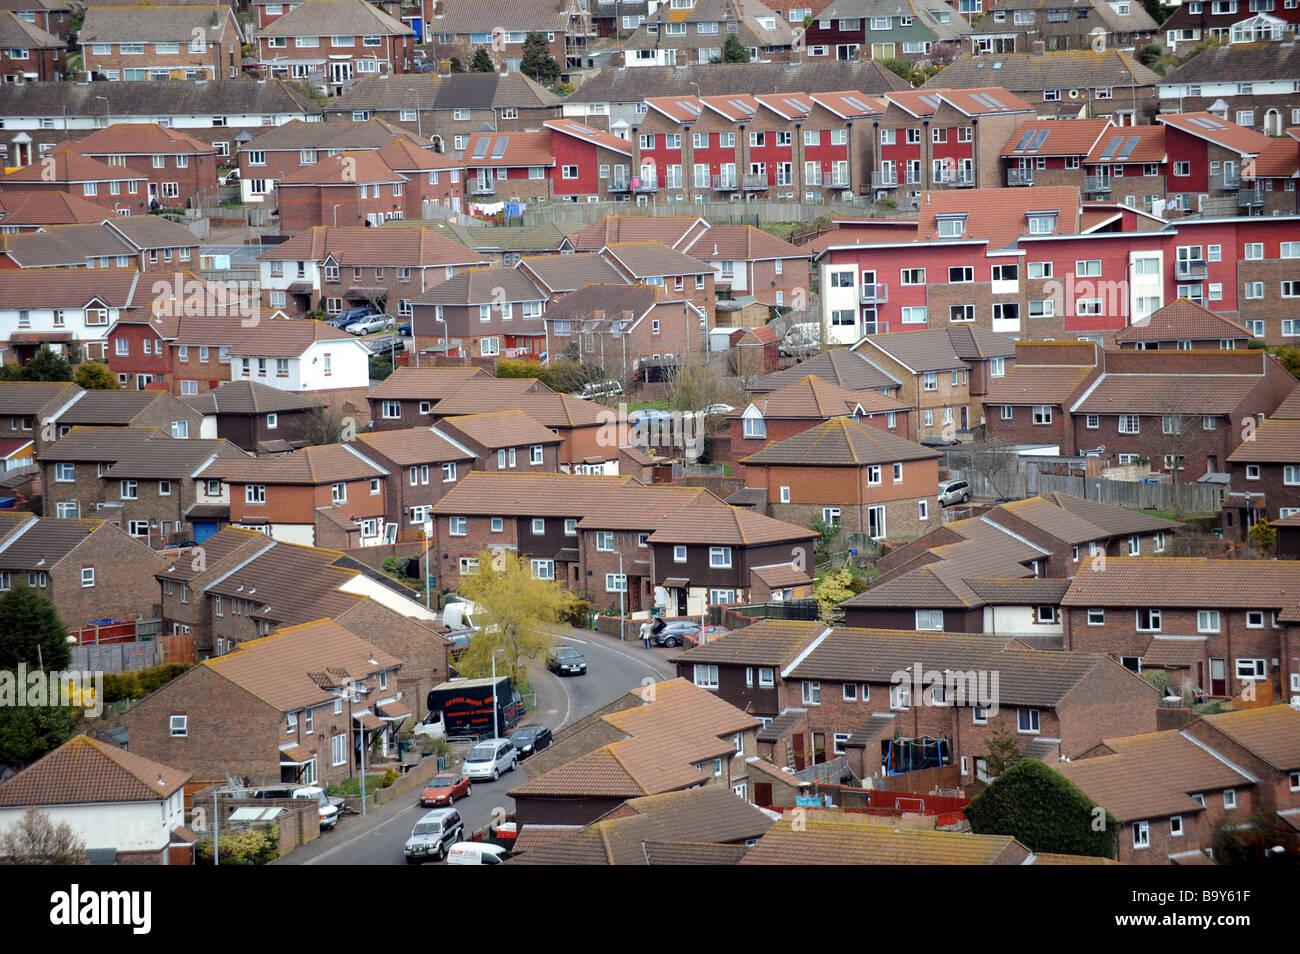 The Whitehawk housing estate in Brighton East Sussex UK Stock Photo